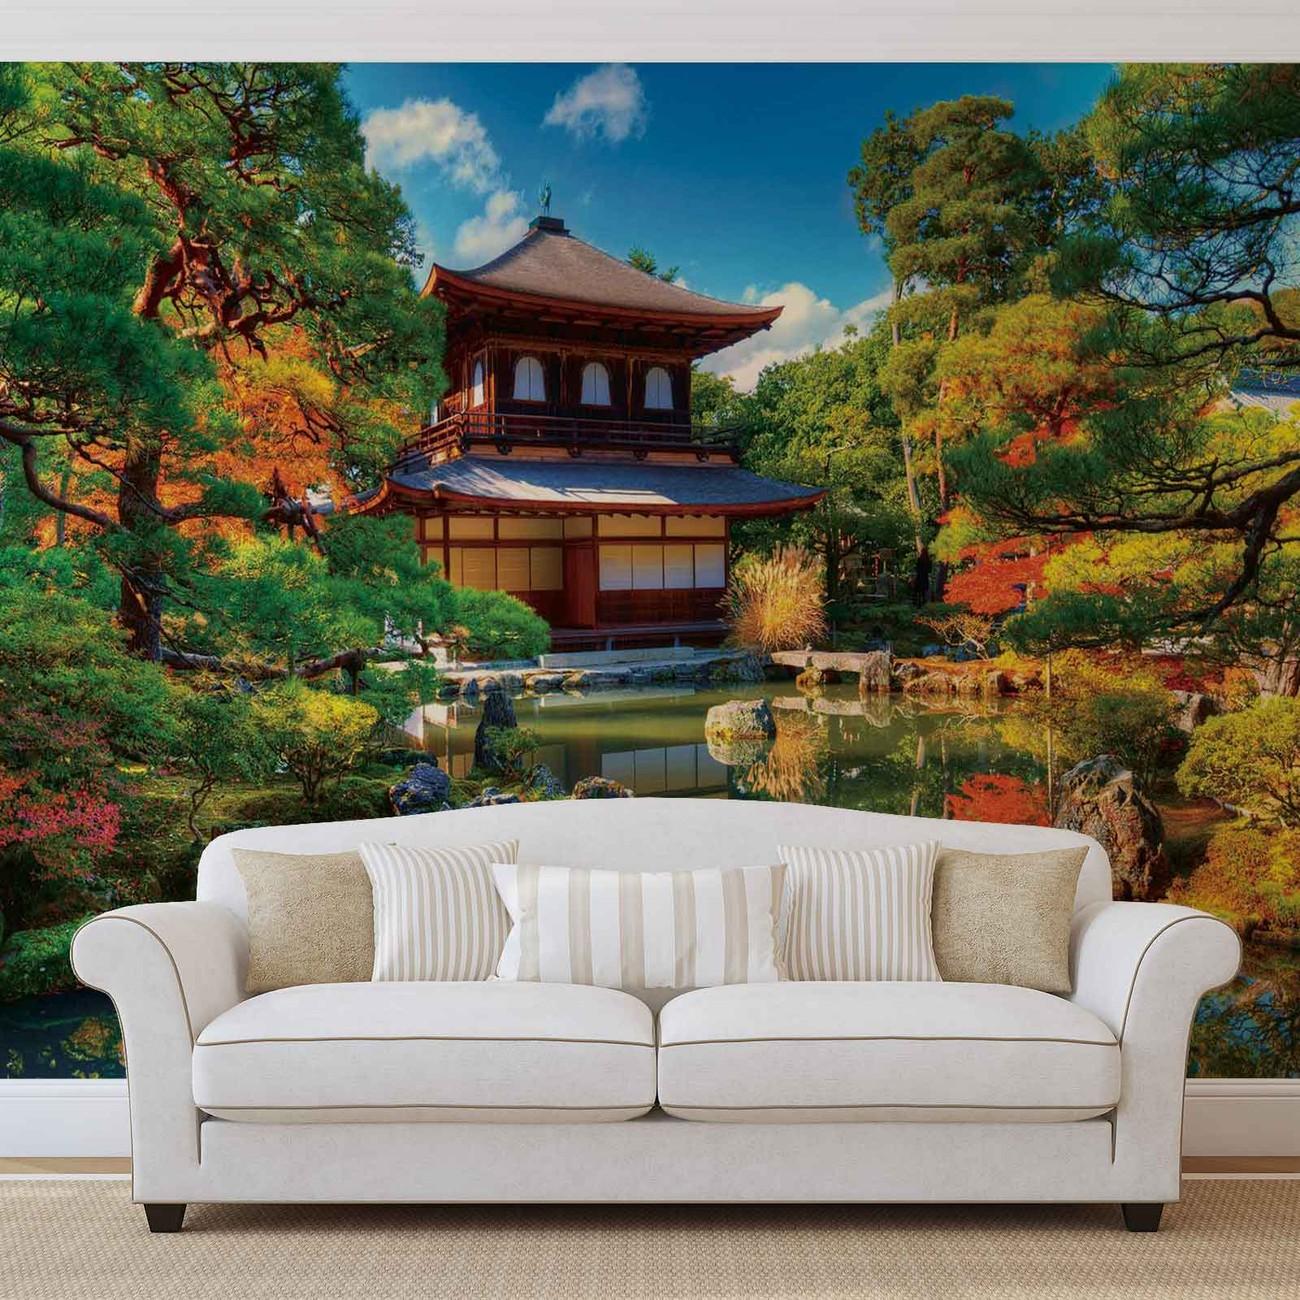 Temple zen japan culture wall paper mural buy at europosters for Poster mural zen deco